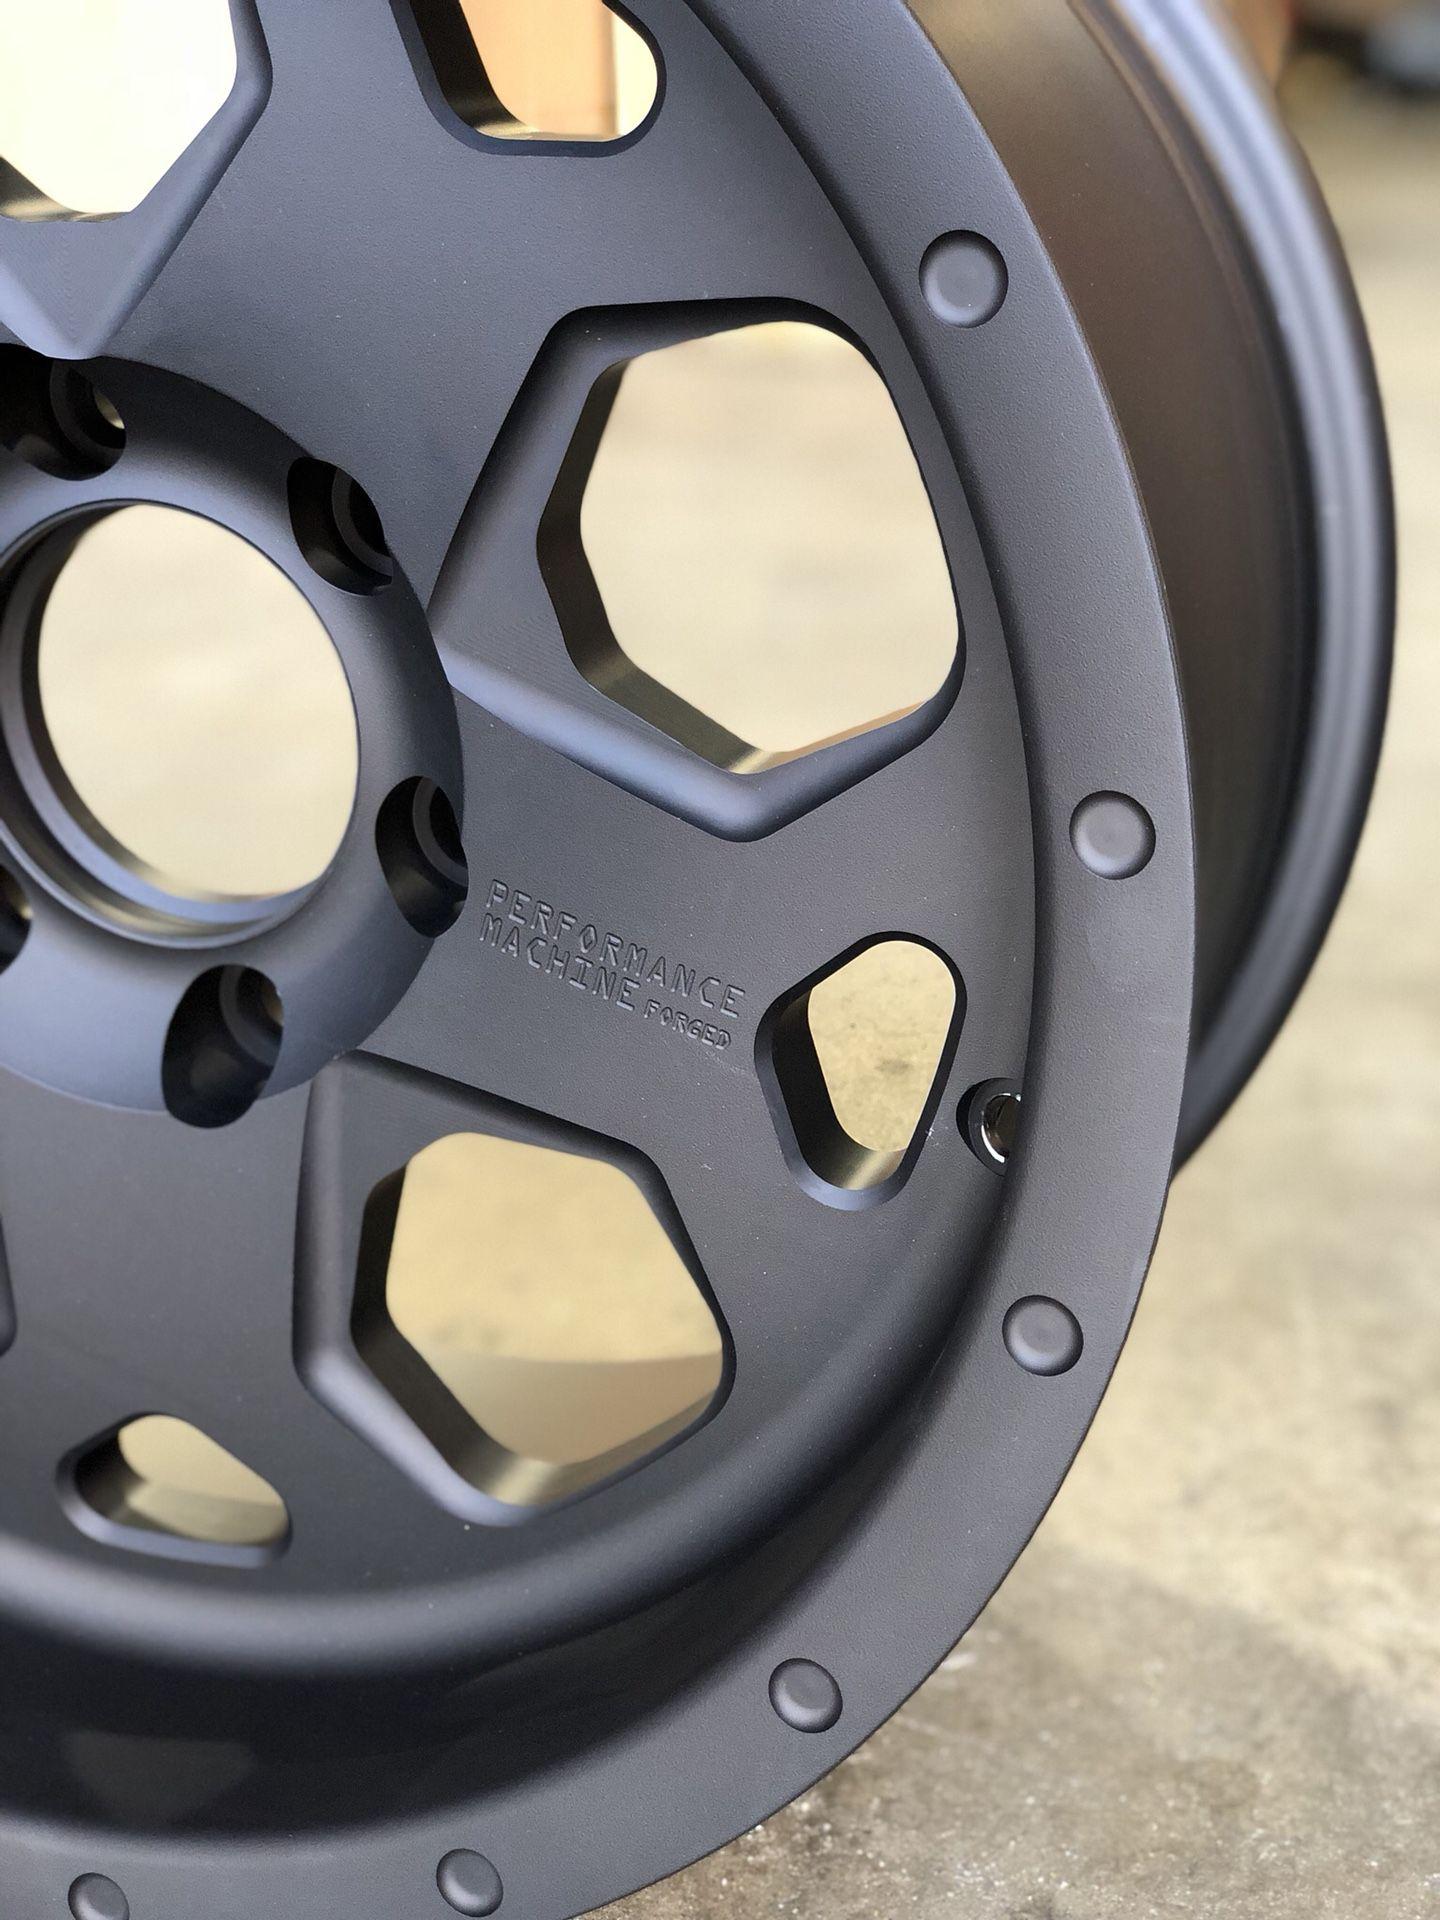 Raptor wheels by Performance Machine